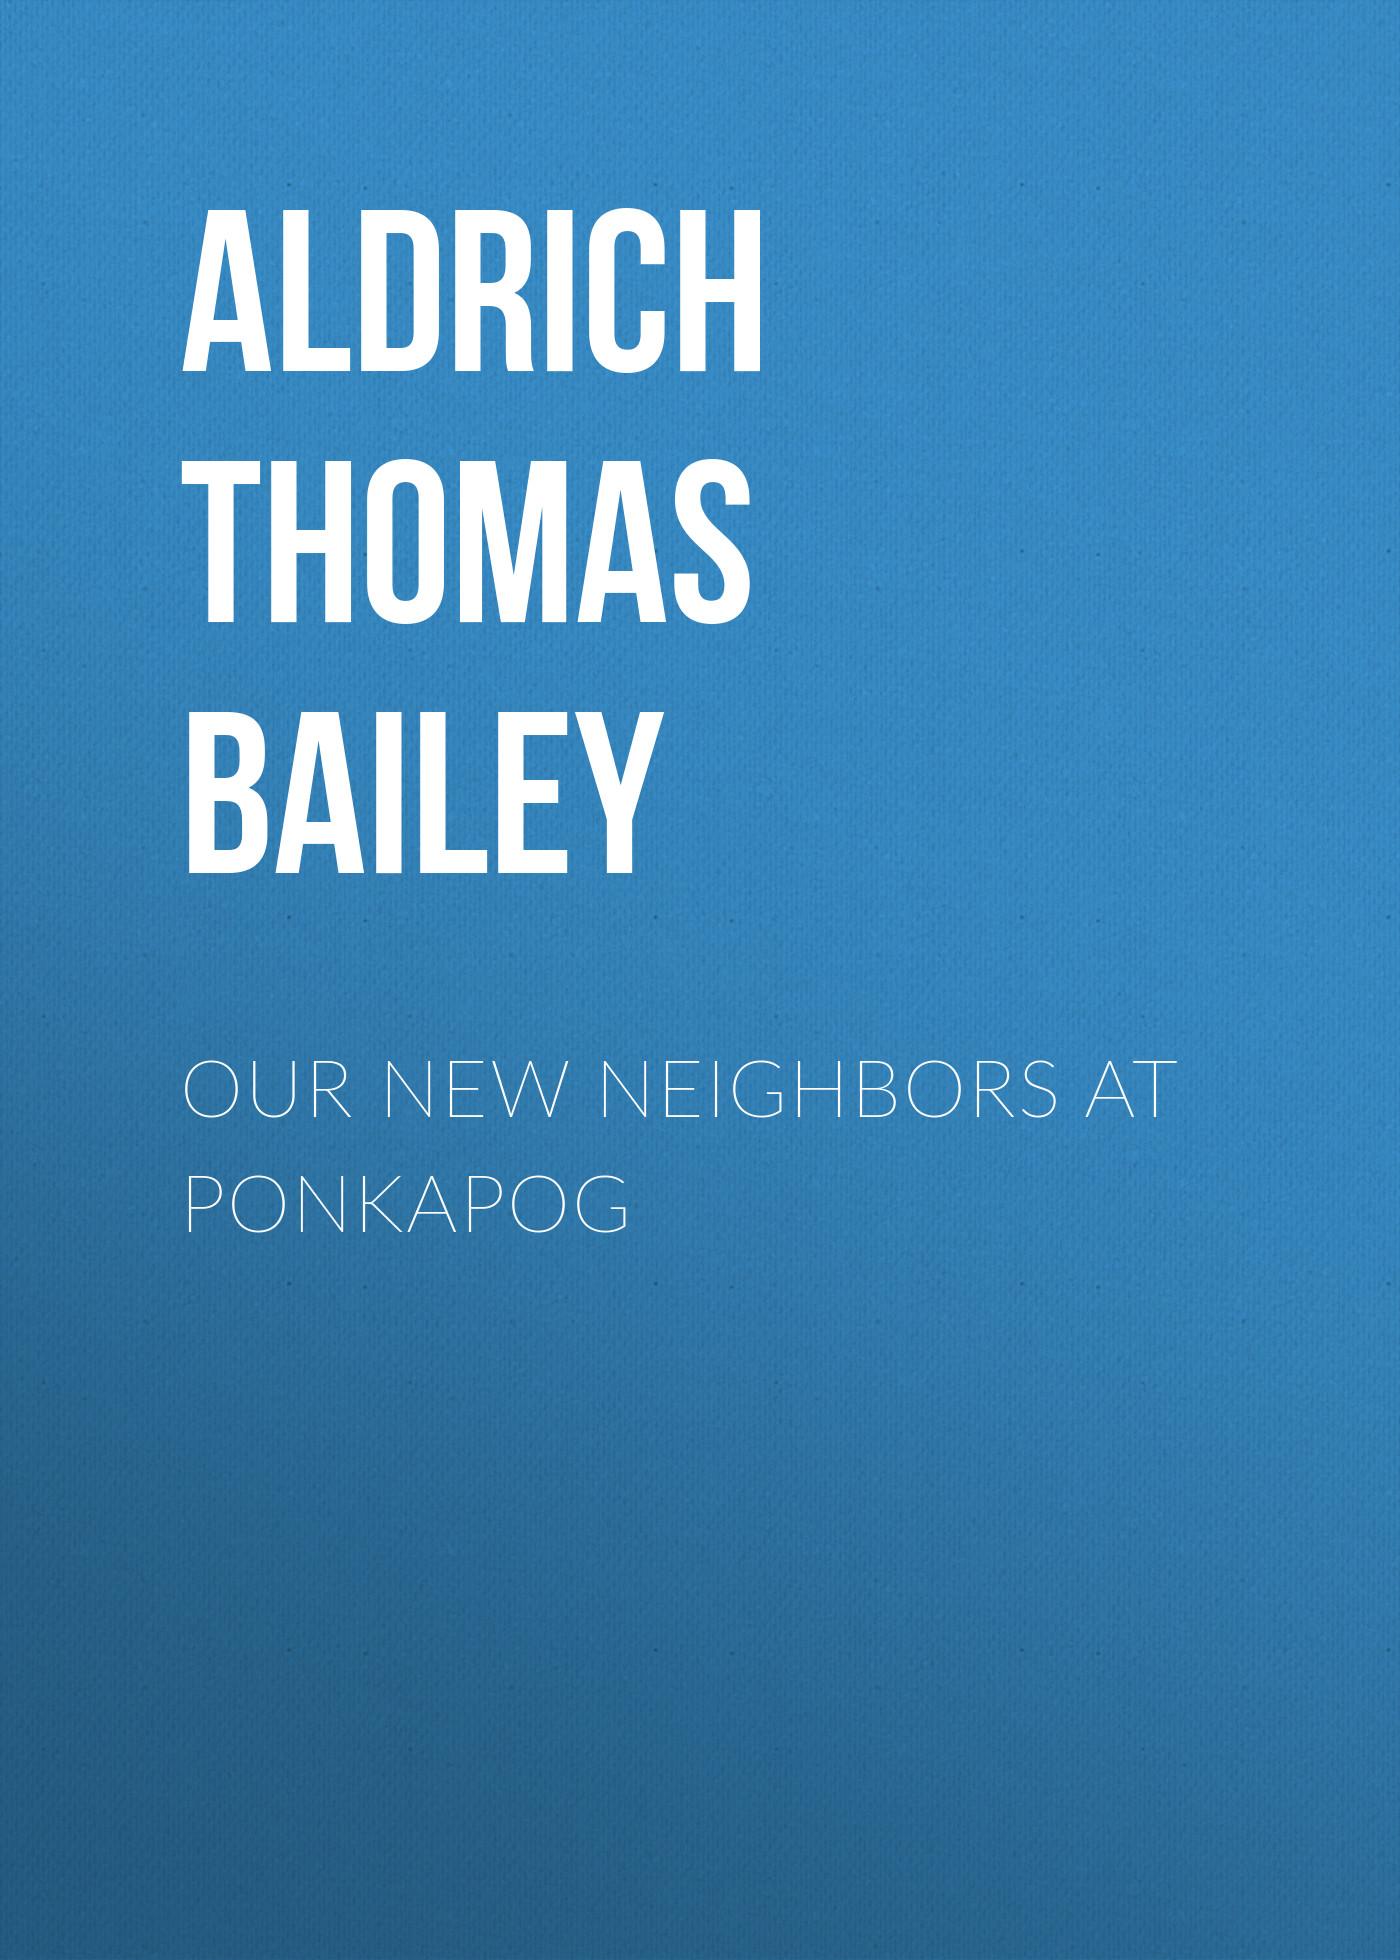 Aldrich Thomas Bailey Our New Neighbors At Ponkapog